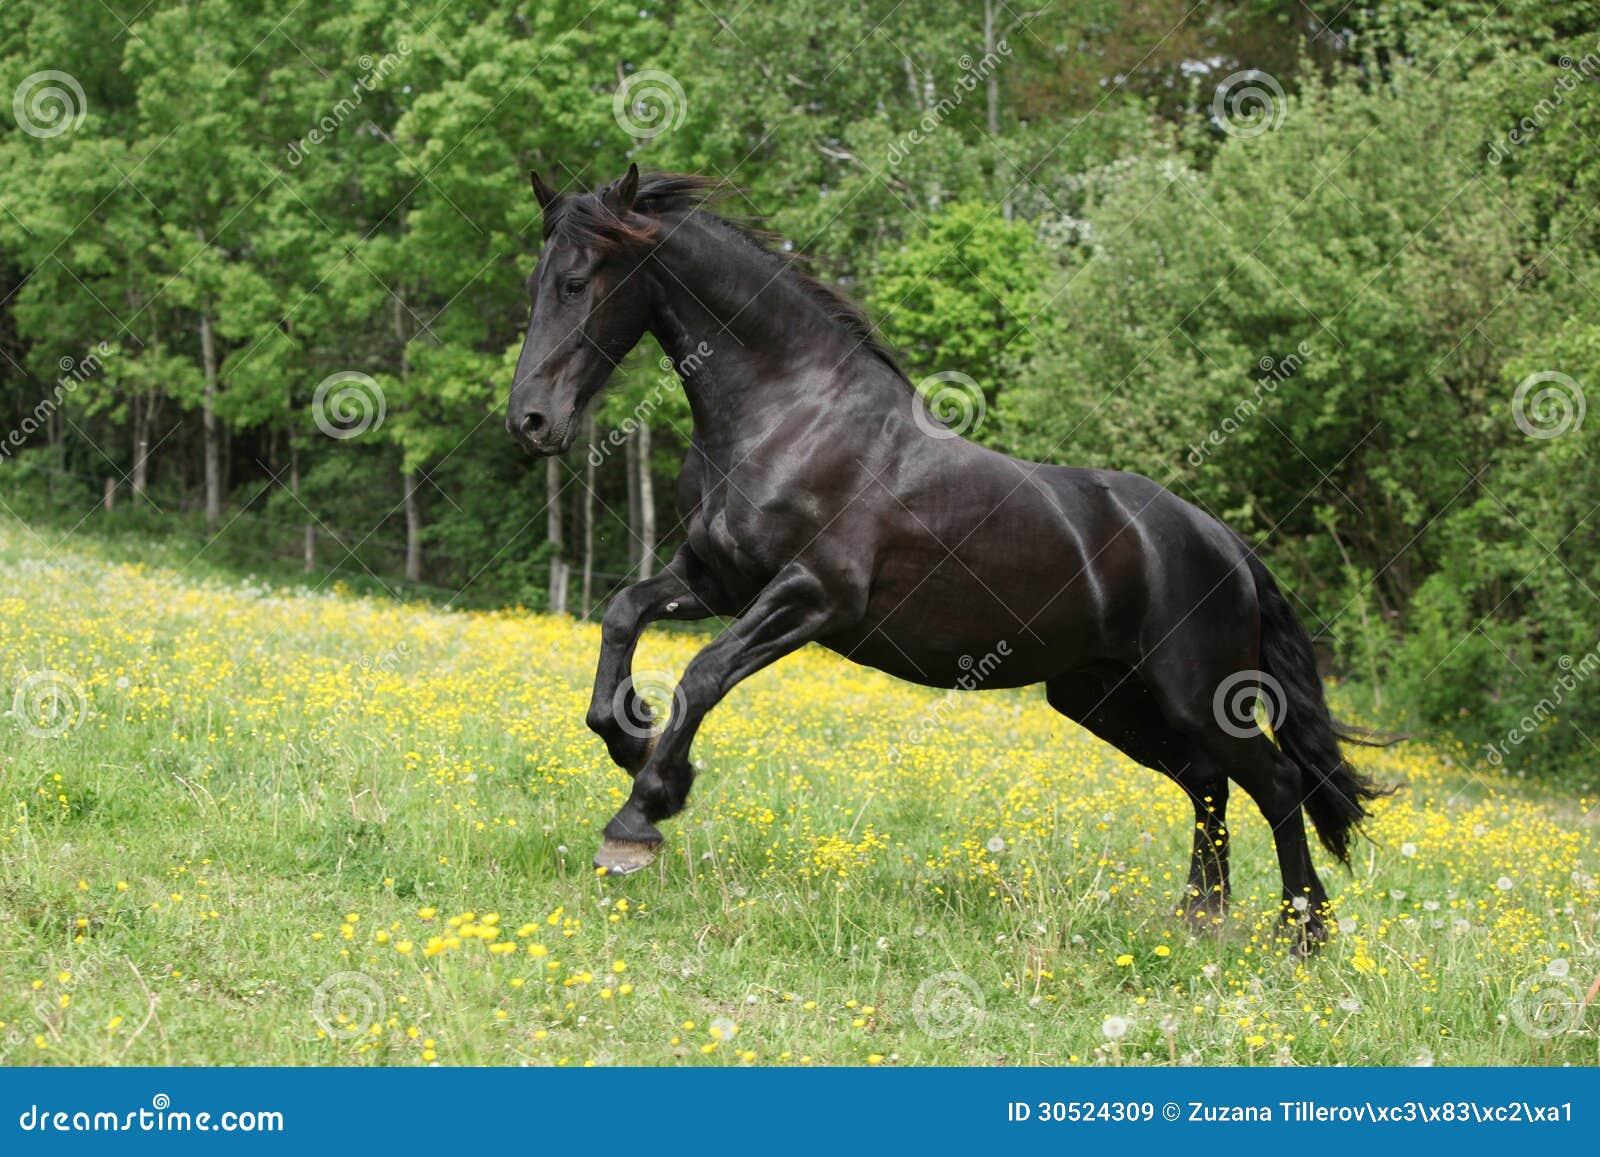 Friesian Horse Black Stallion Galloping Stock Photos ...  |Friesian Horses Running